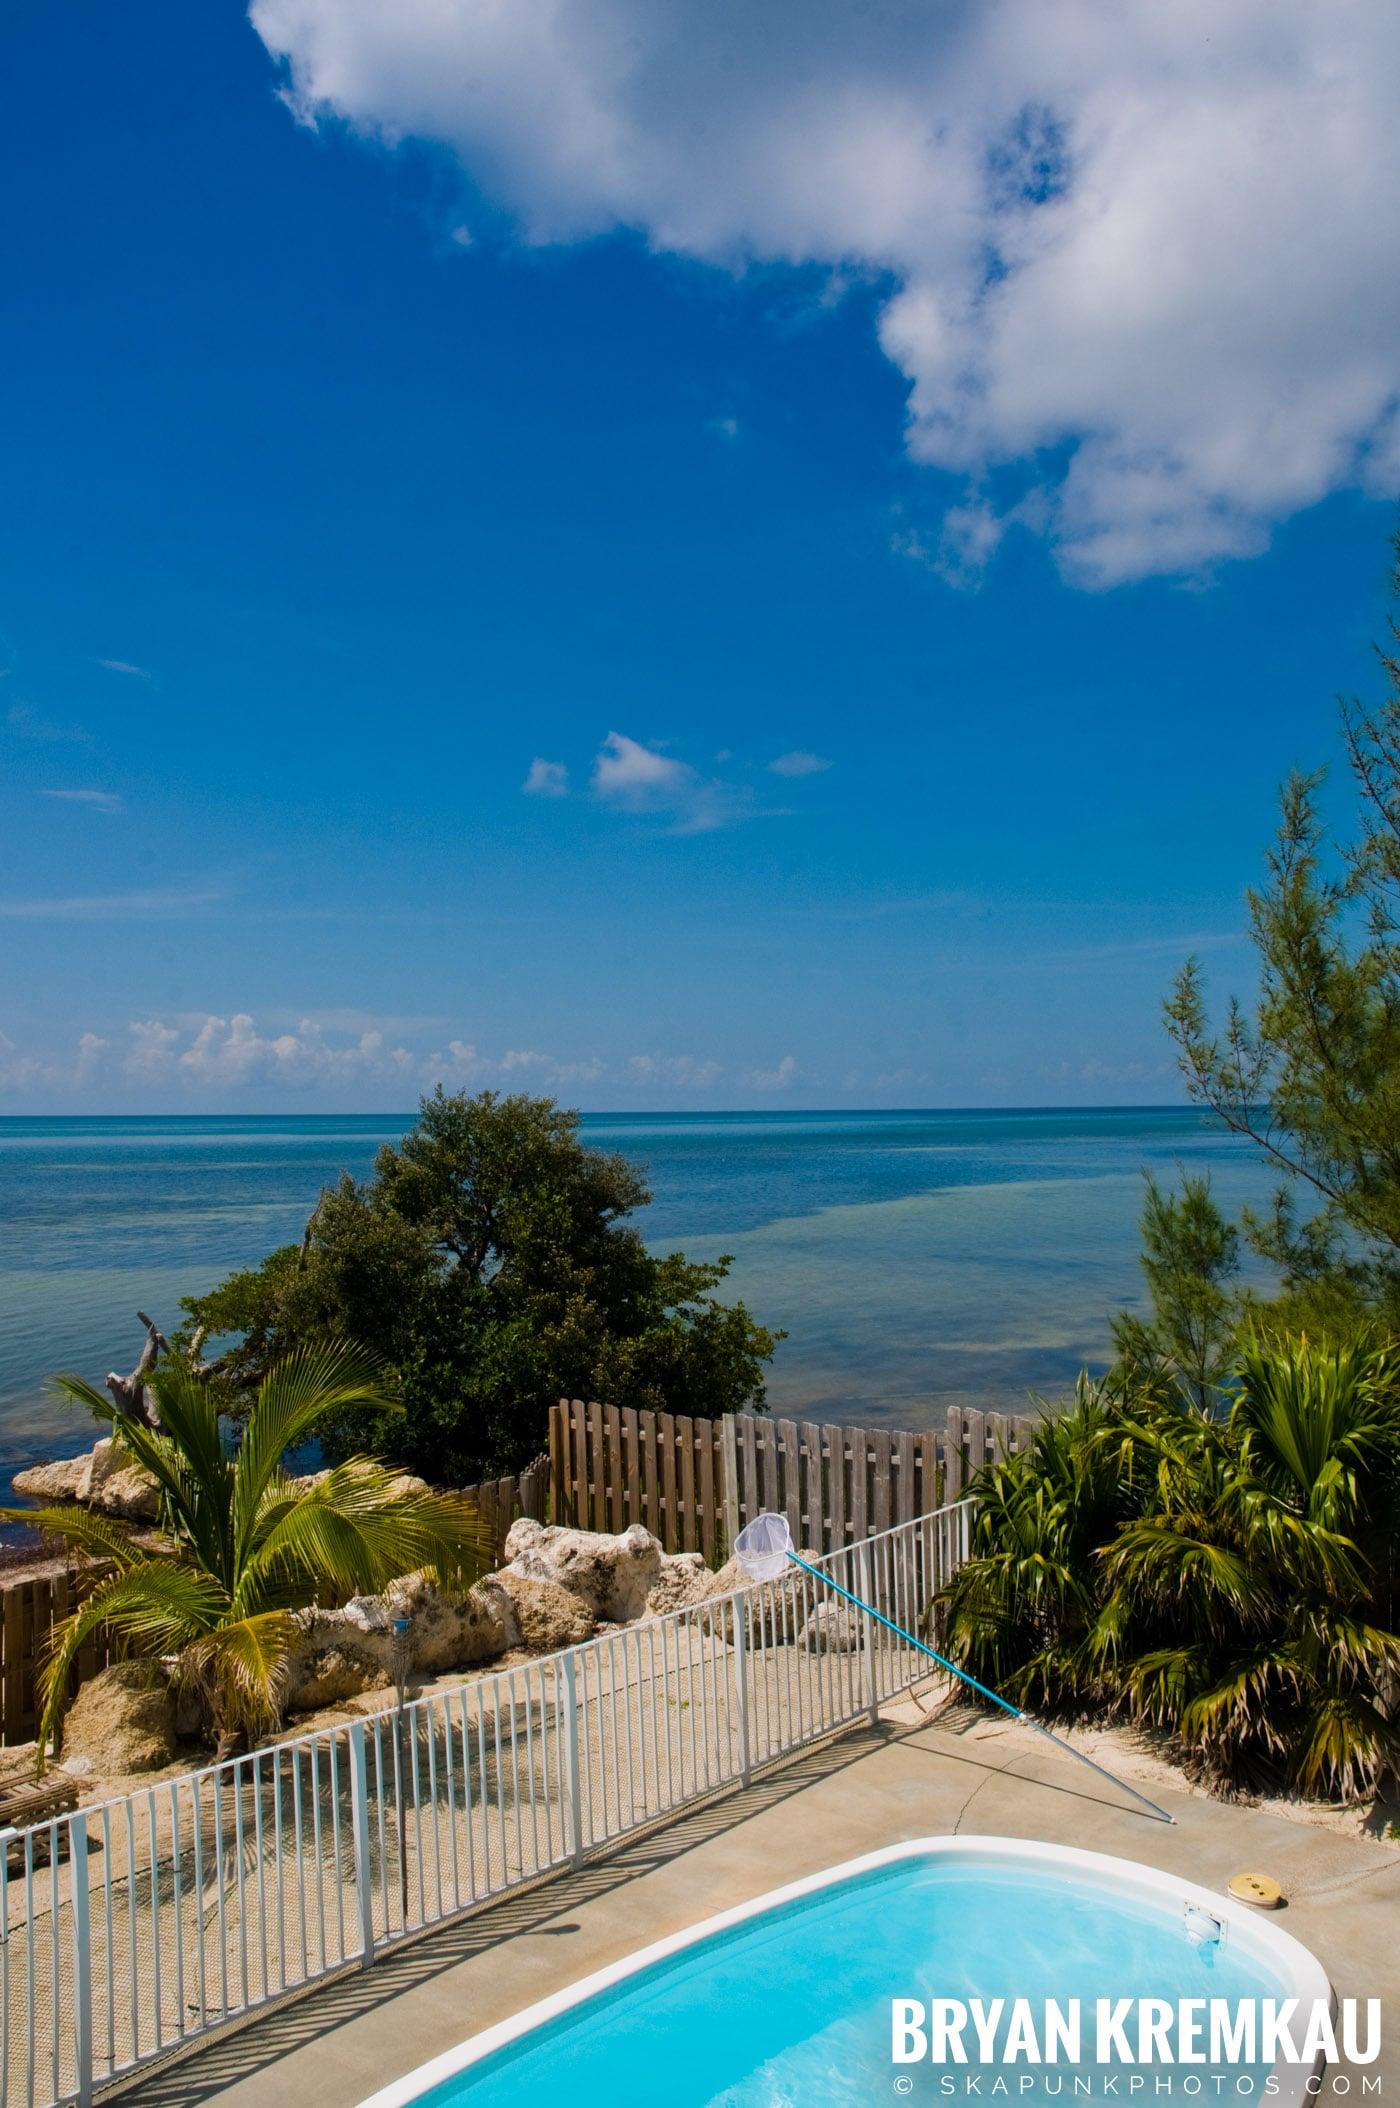 Florida Keys Vacation - 7.09.10 - 7.15.10 (7)